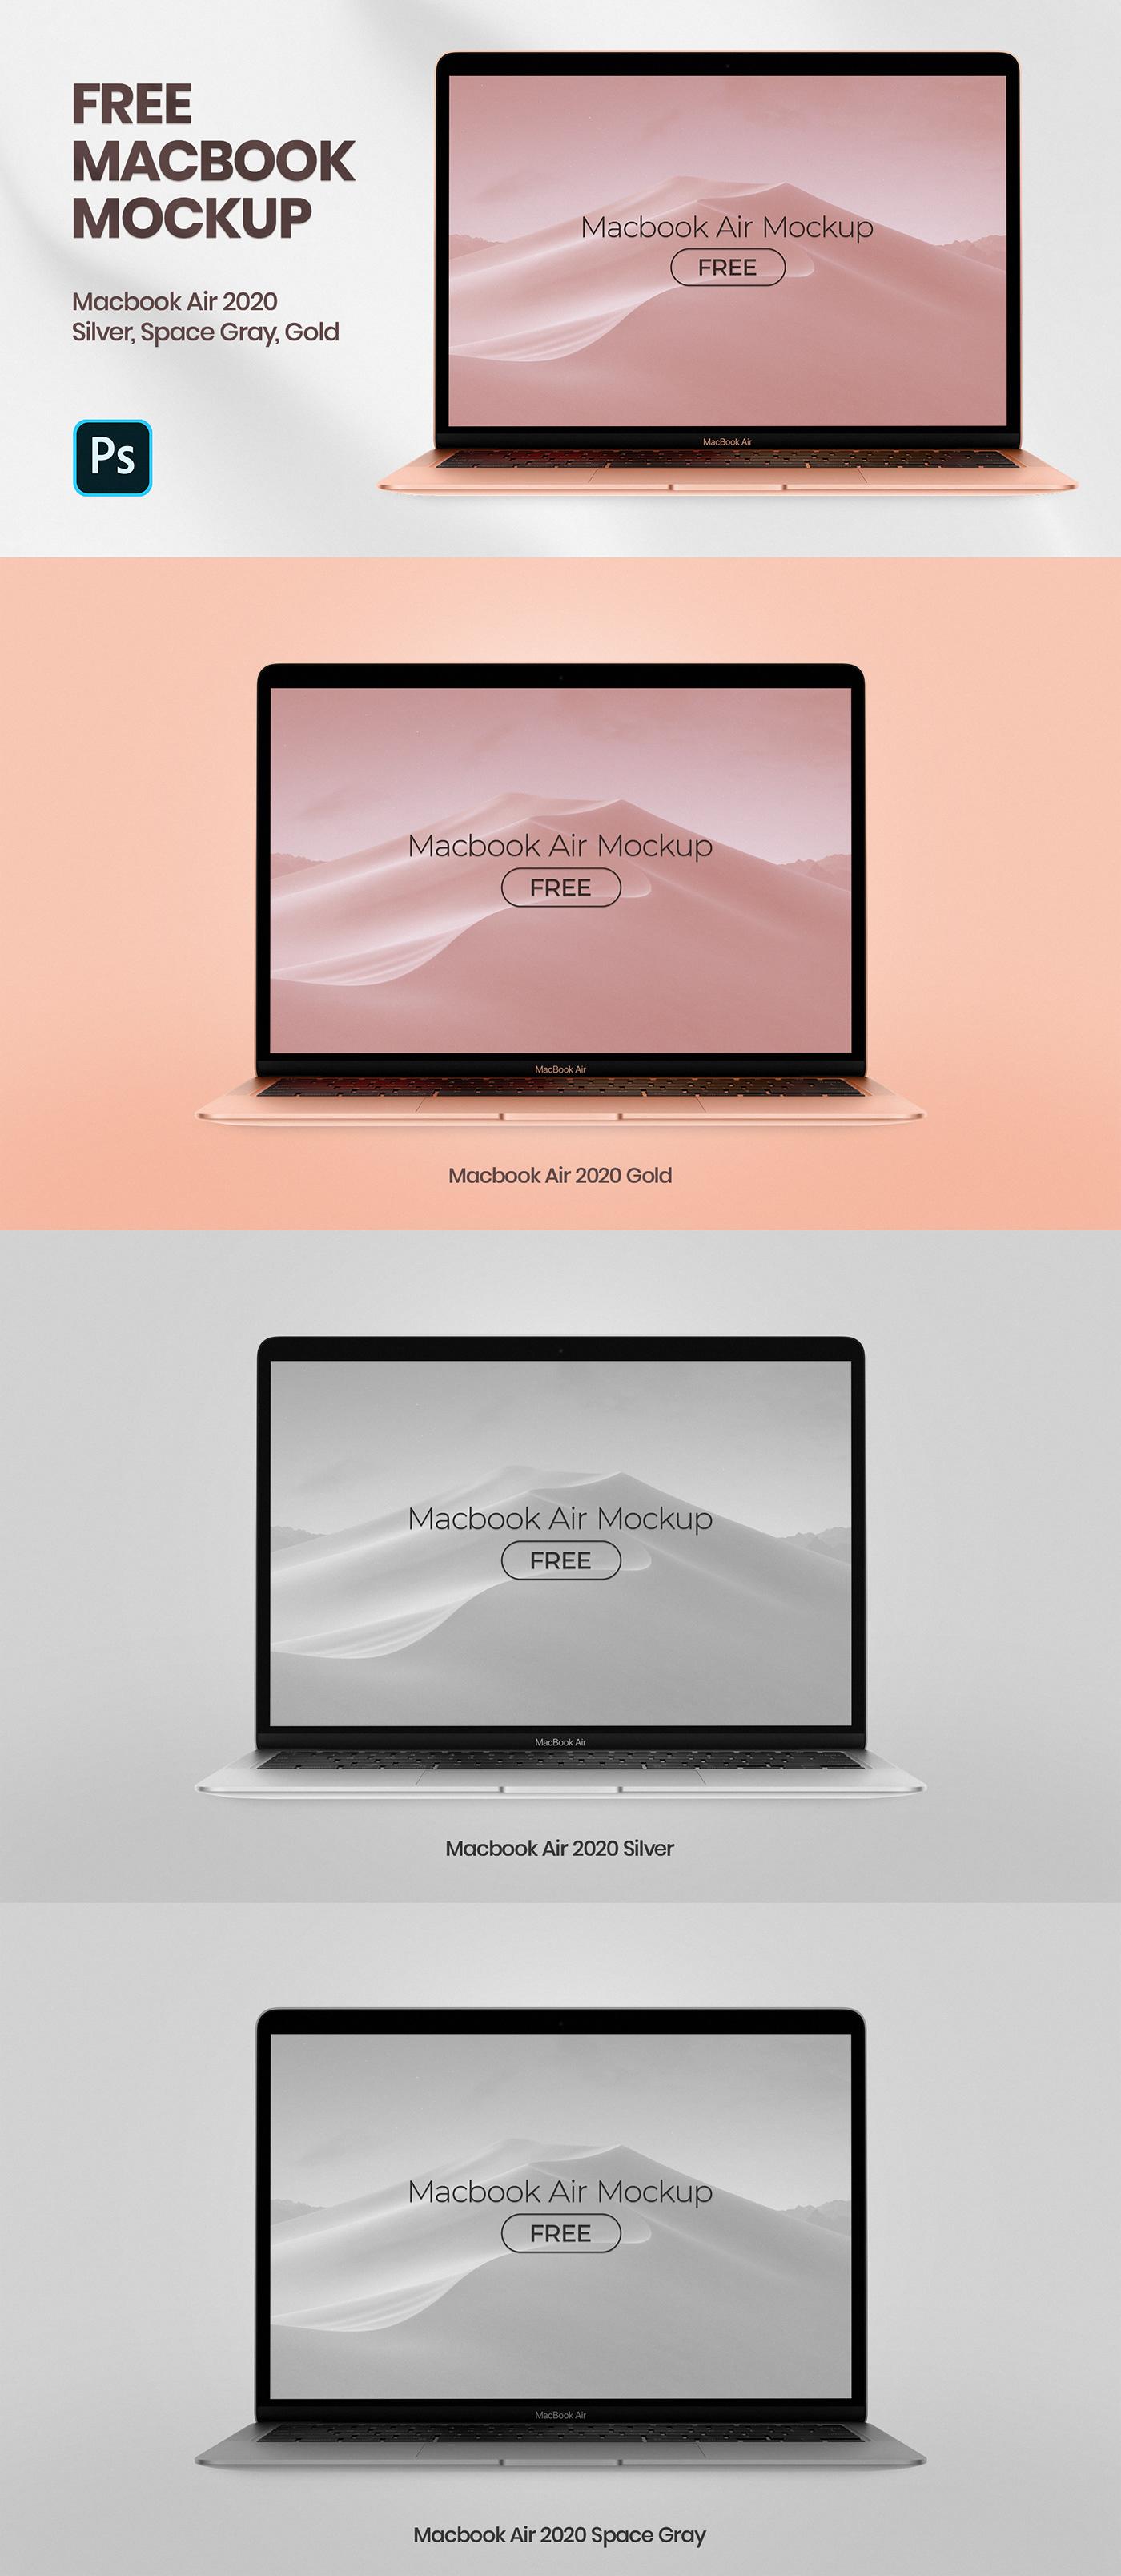 free,free mockup ,macbook,Macbook Air,macbook air mockup,macbook mockup,Mockup,psd